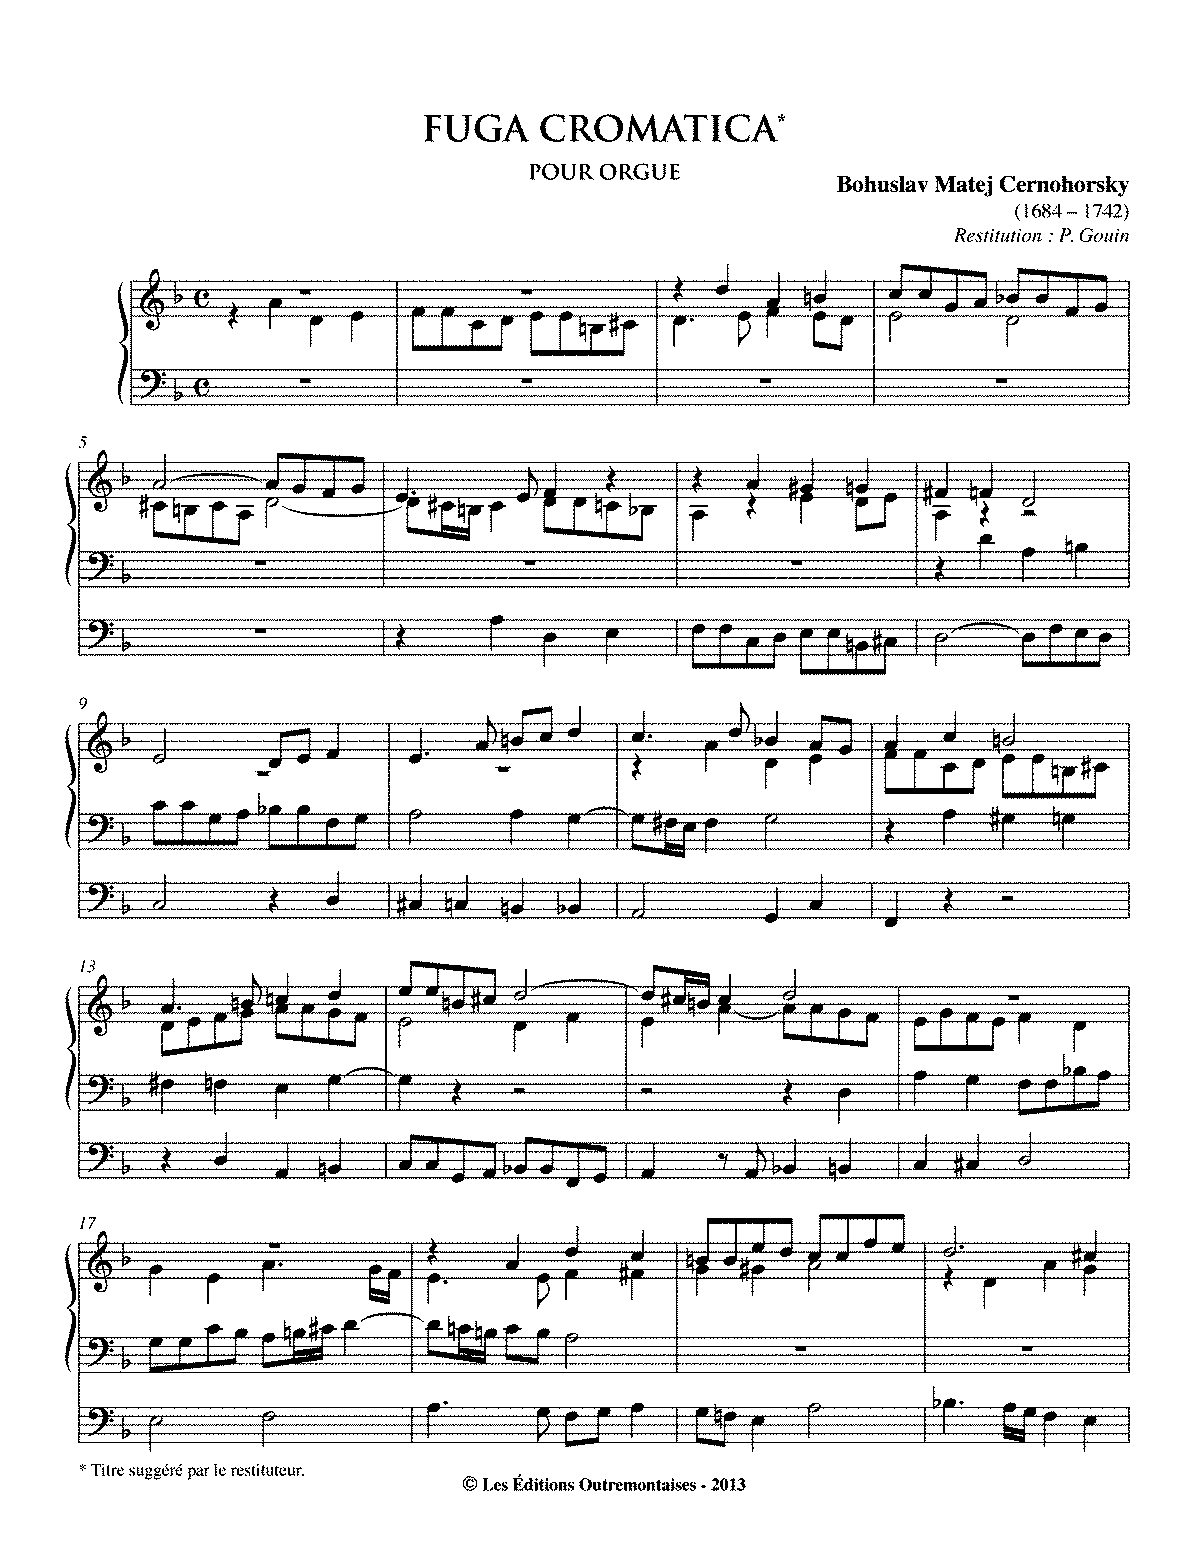 Fuga Cromatica in D minor, MAB 3.2 (Černohorský, Bohuslav Matěj ...